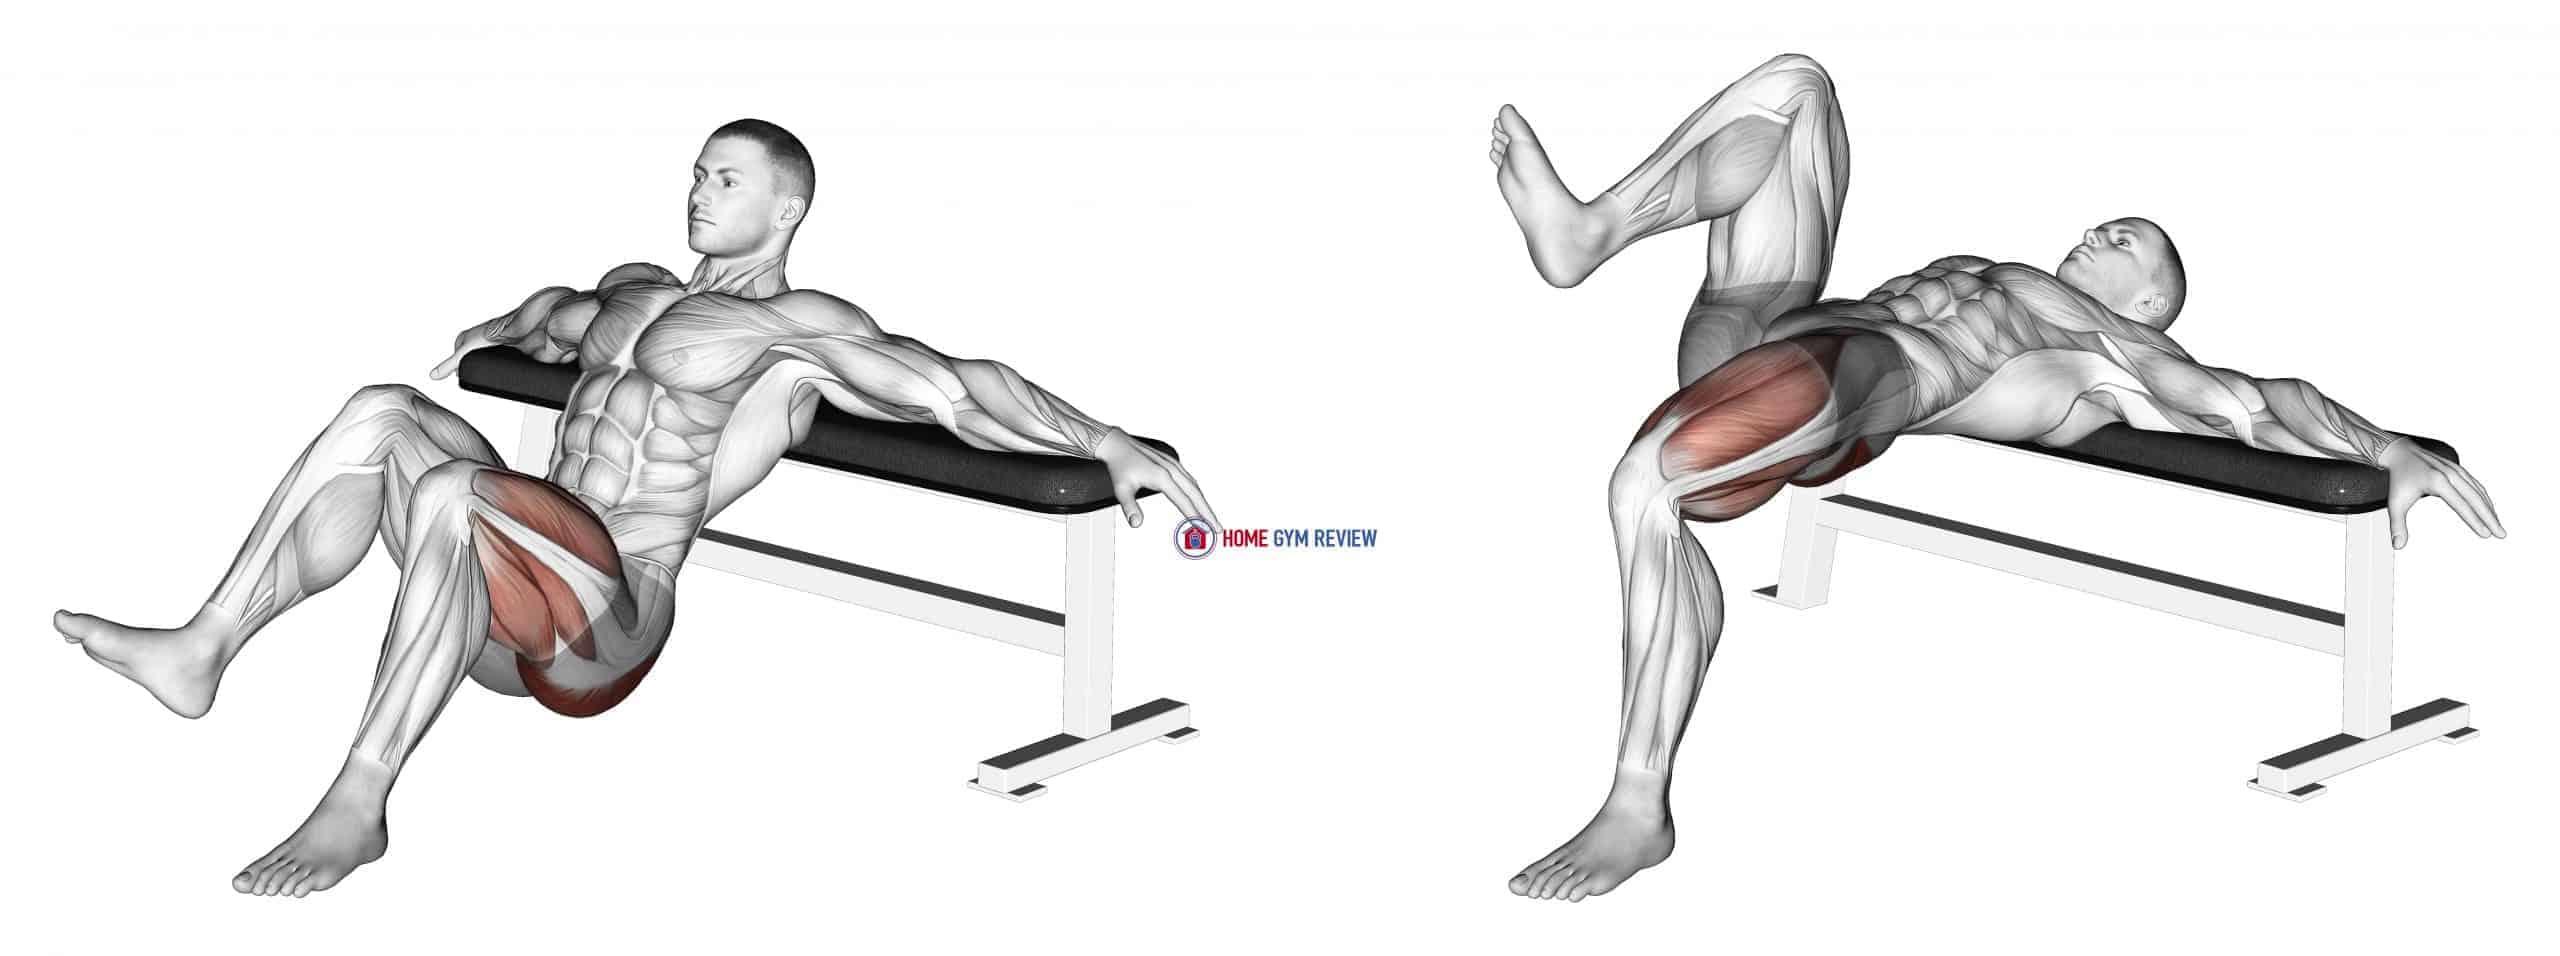 Single Leg Hip Thrusts